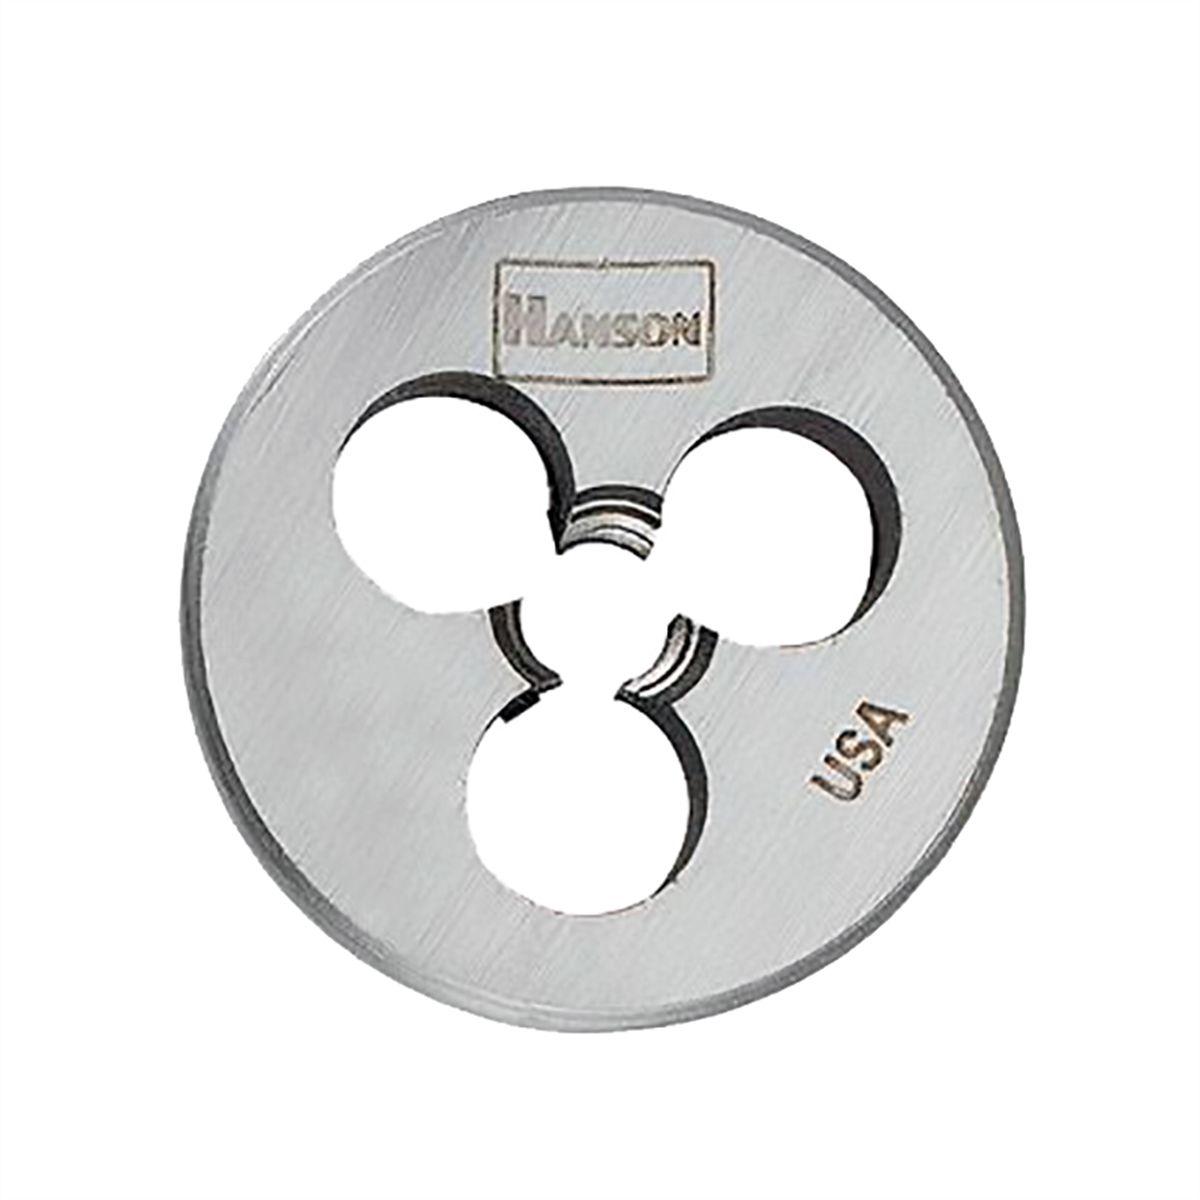 "Hanson 6112 High Carbon Steel Hexagon 5//8/"" Across Flat Die 4-40 Nc"